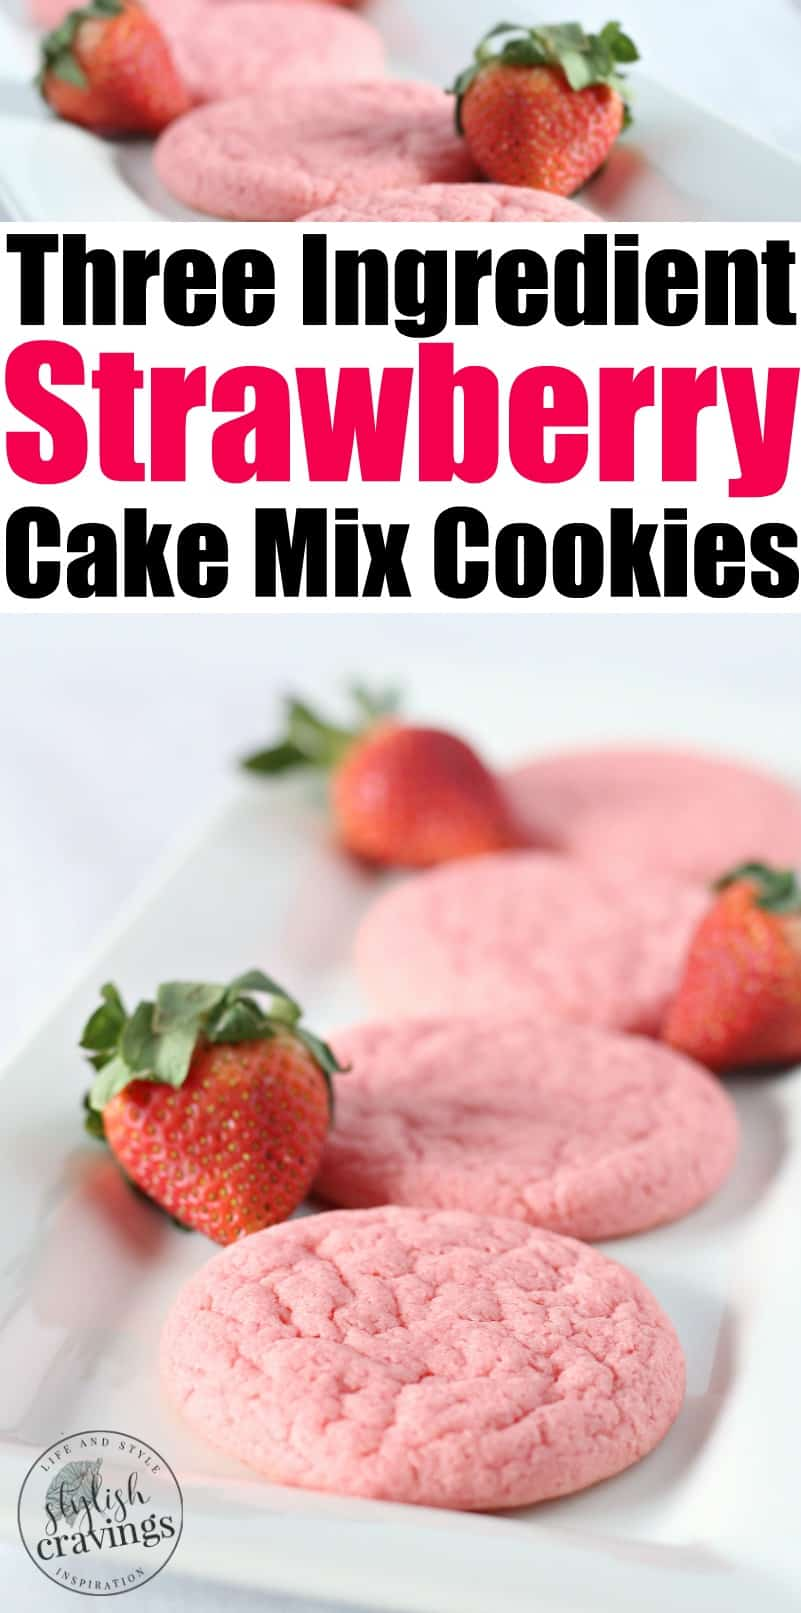 Three Ingredient Strawberry Cookies